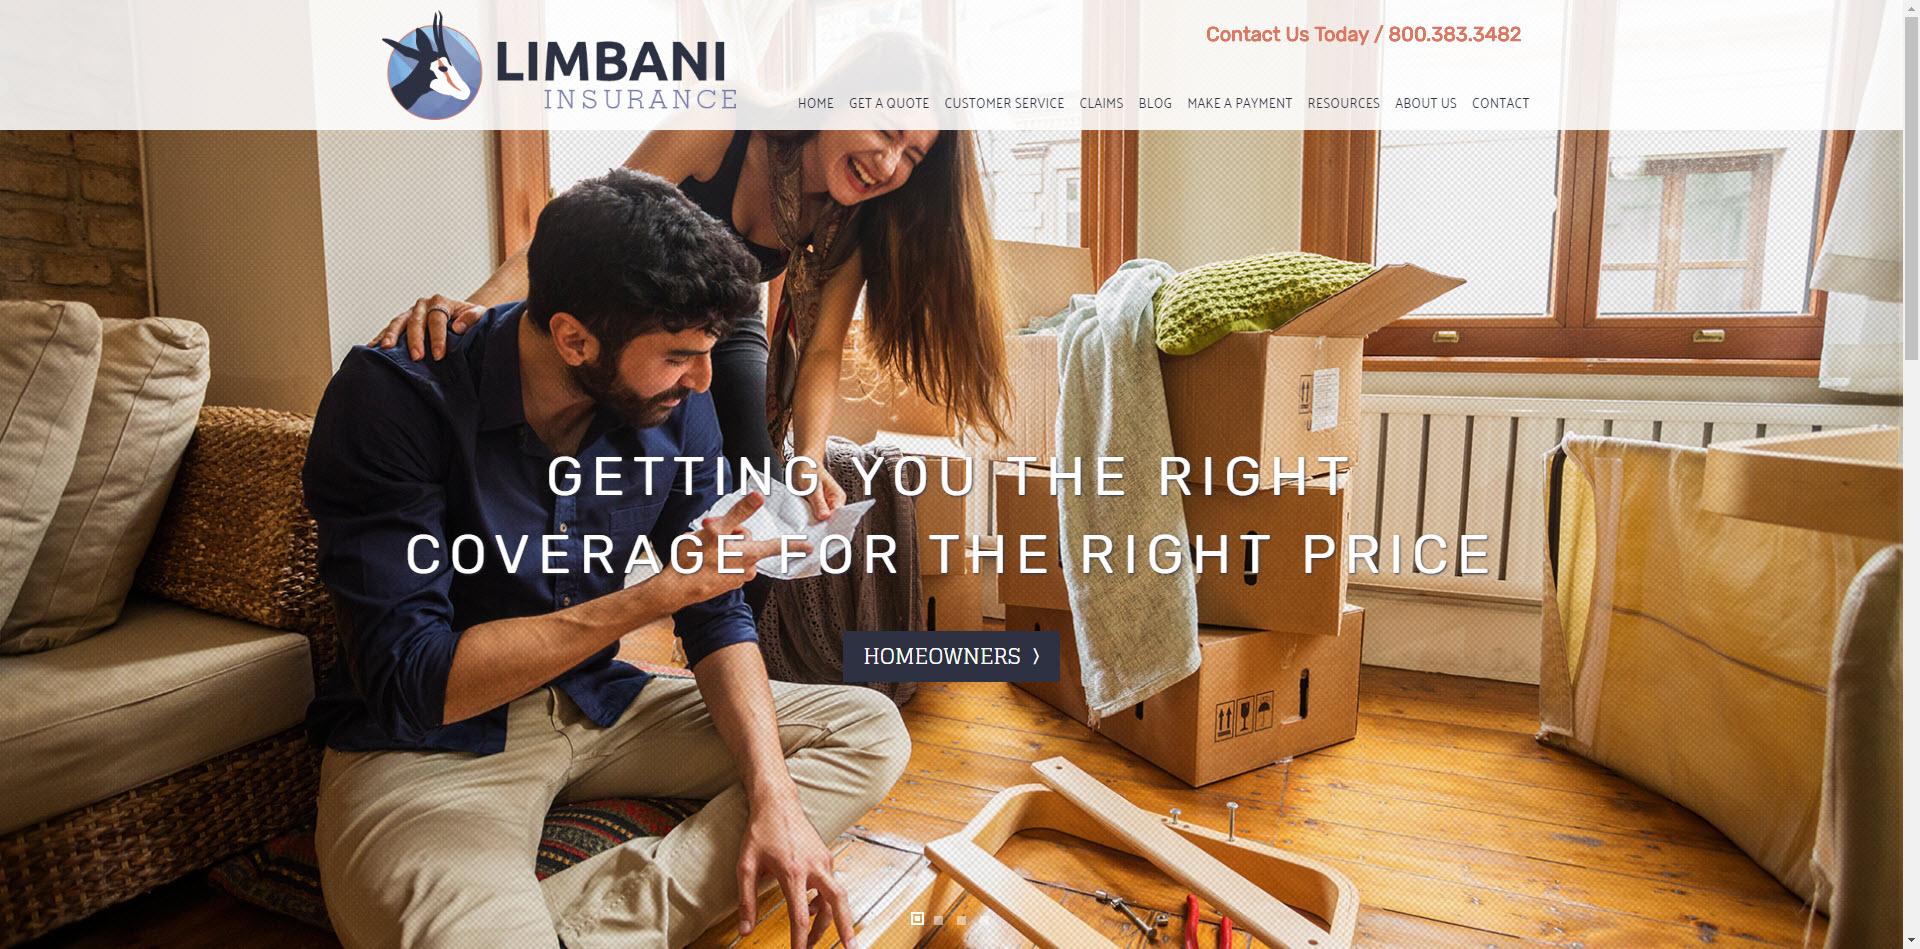 limbani insurance website